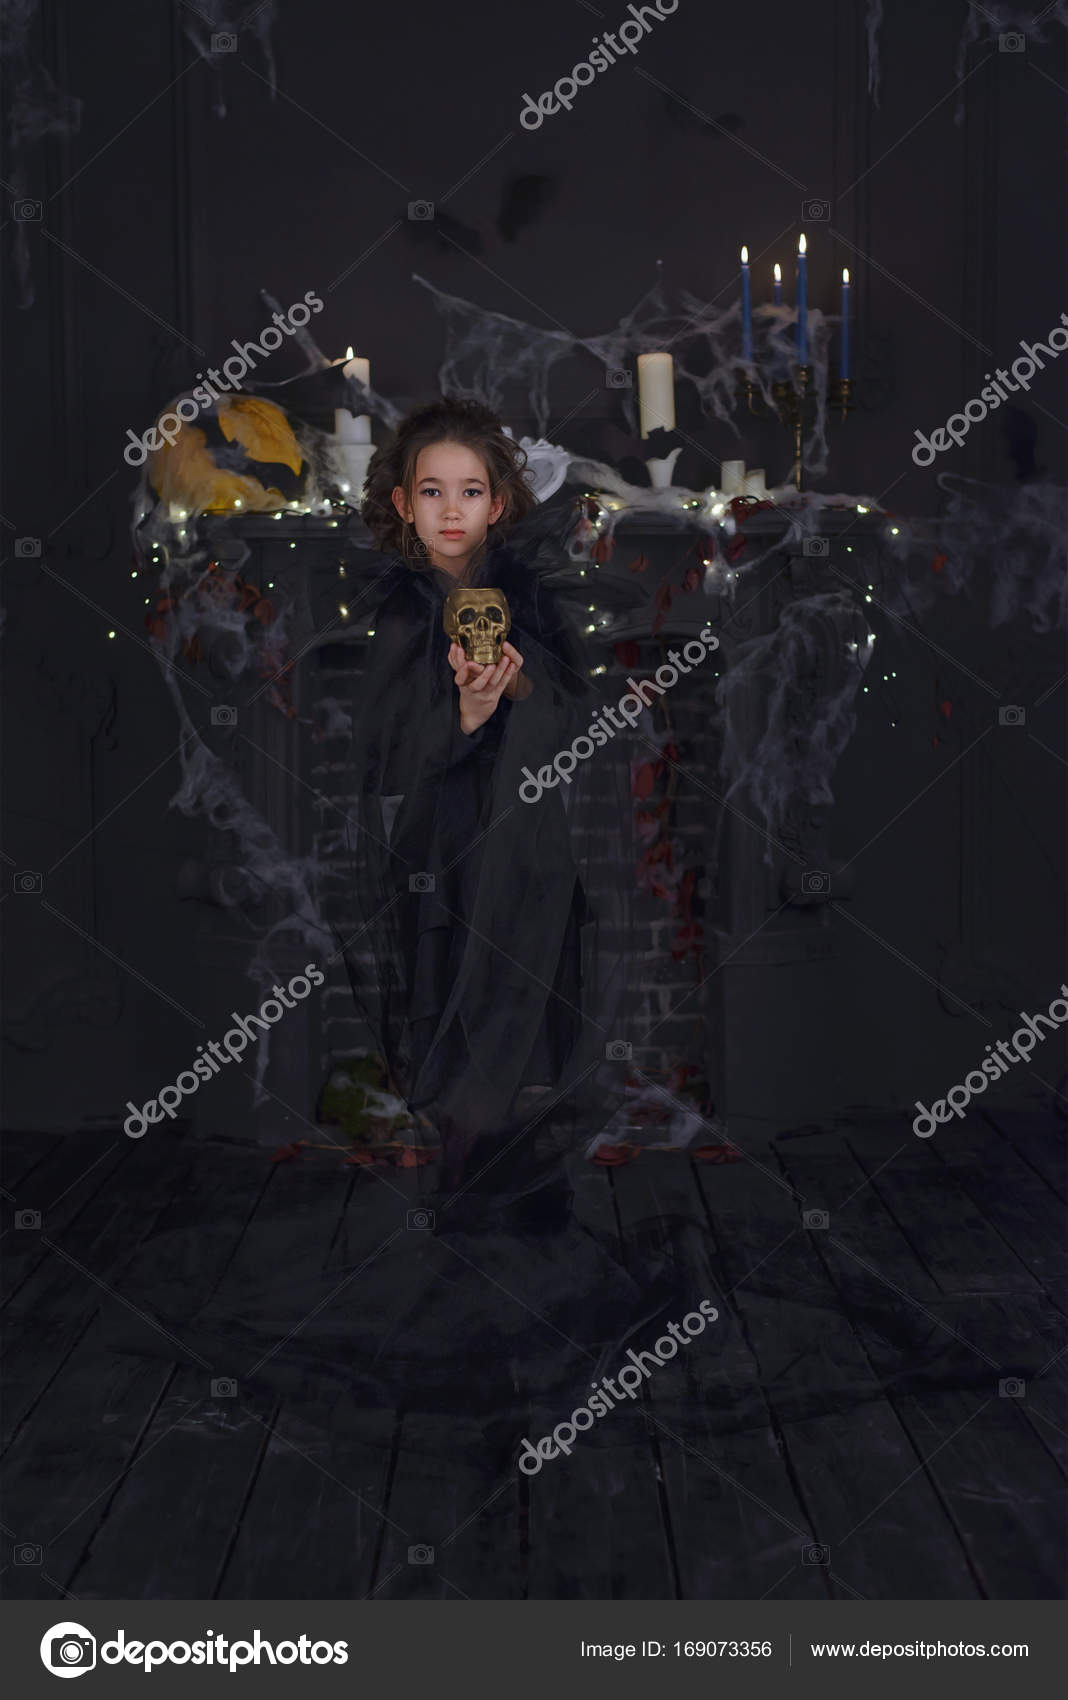 b75f022e4d9 Χαριτωμένο μικρό κορίτσι παιδί μάγισσα κοστούμι αποκριών και διακοσμήσεις —  Φωτογραφία Αρχείου